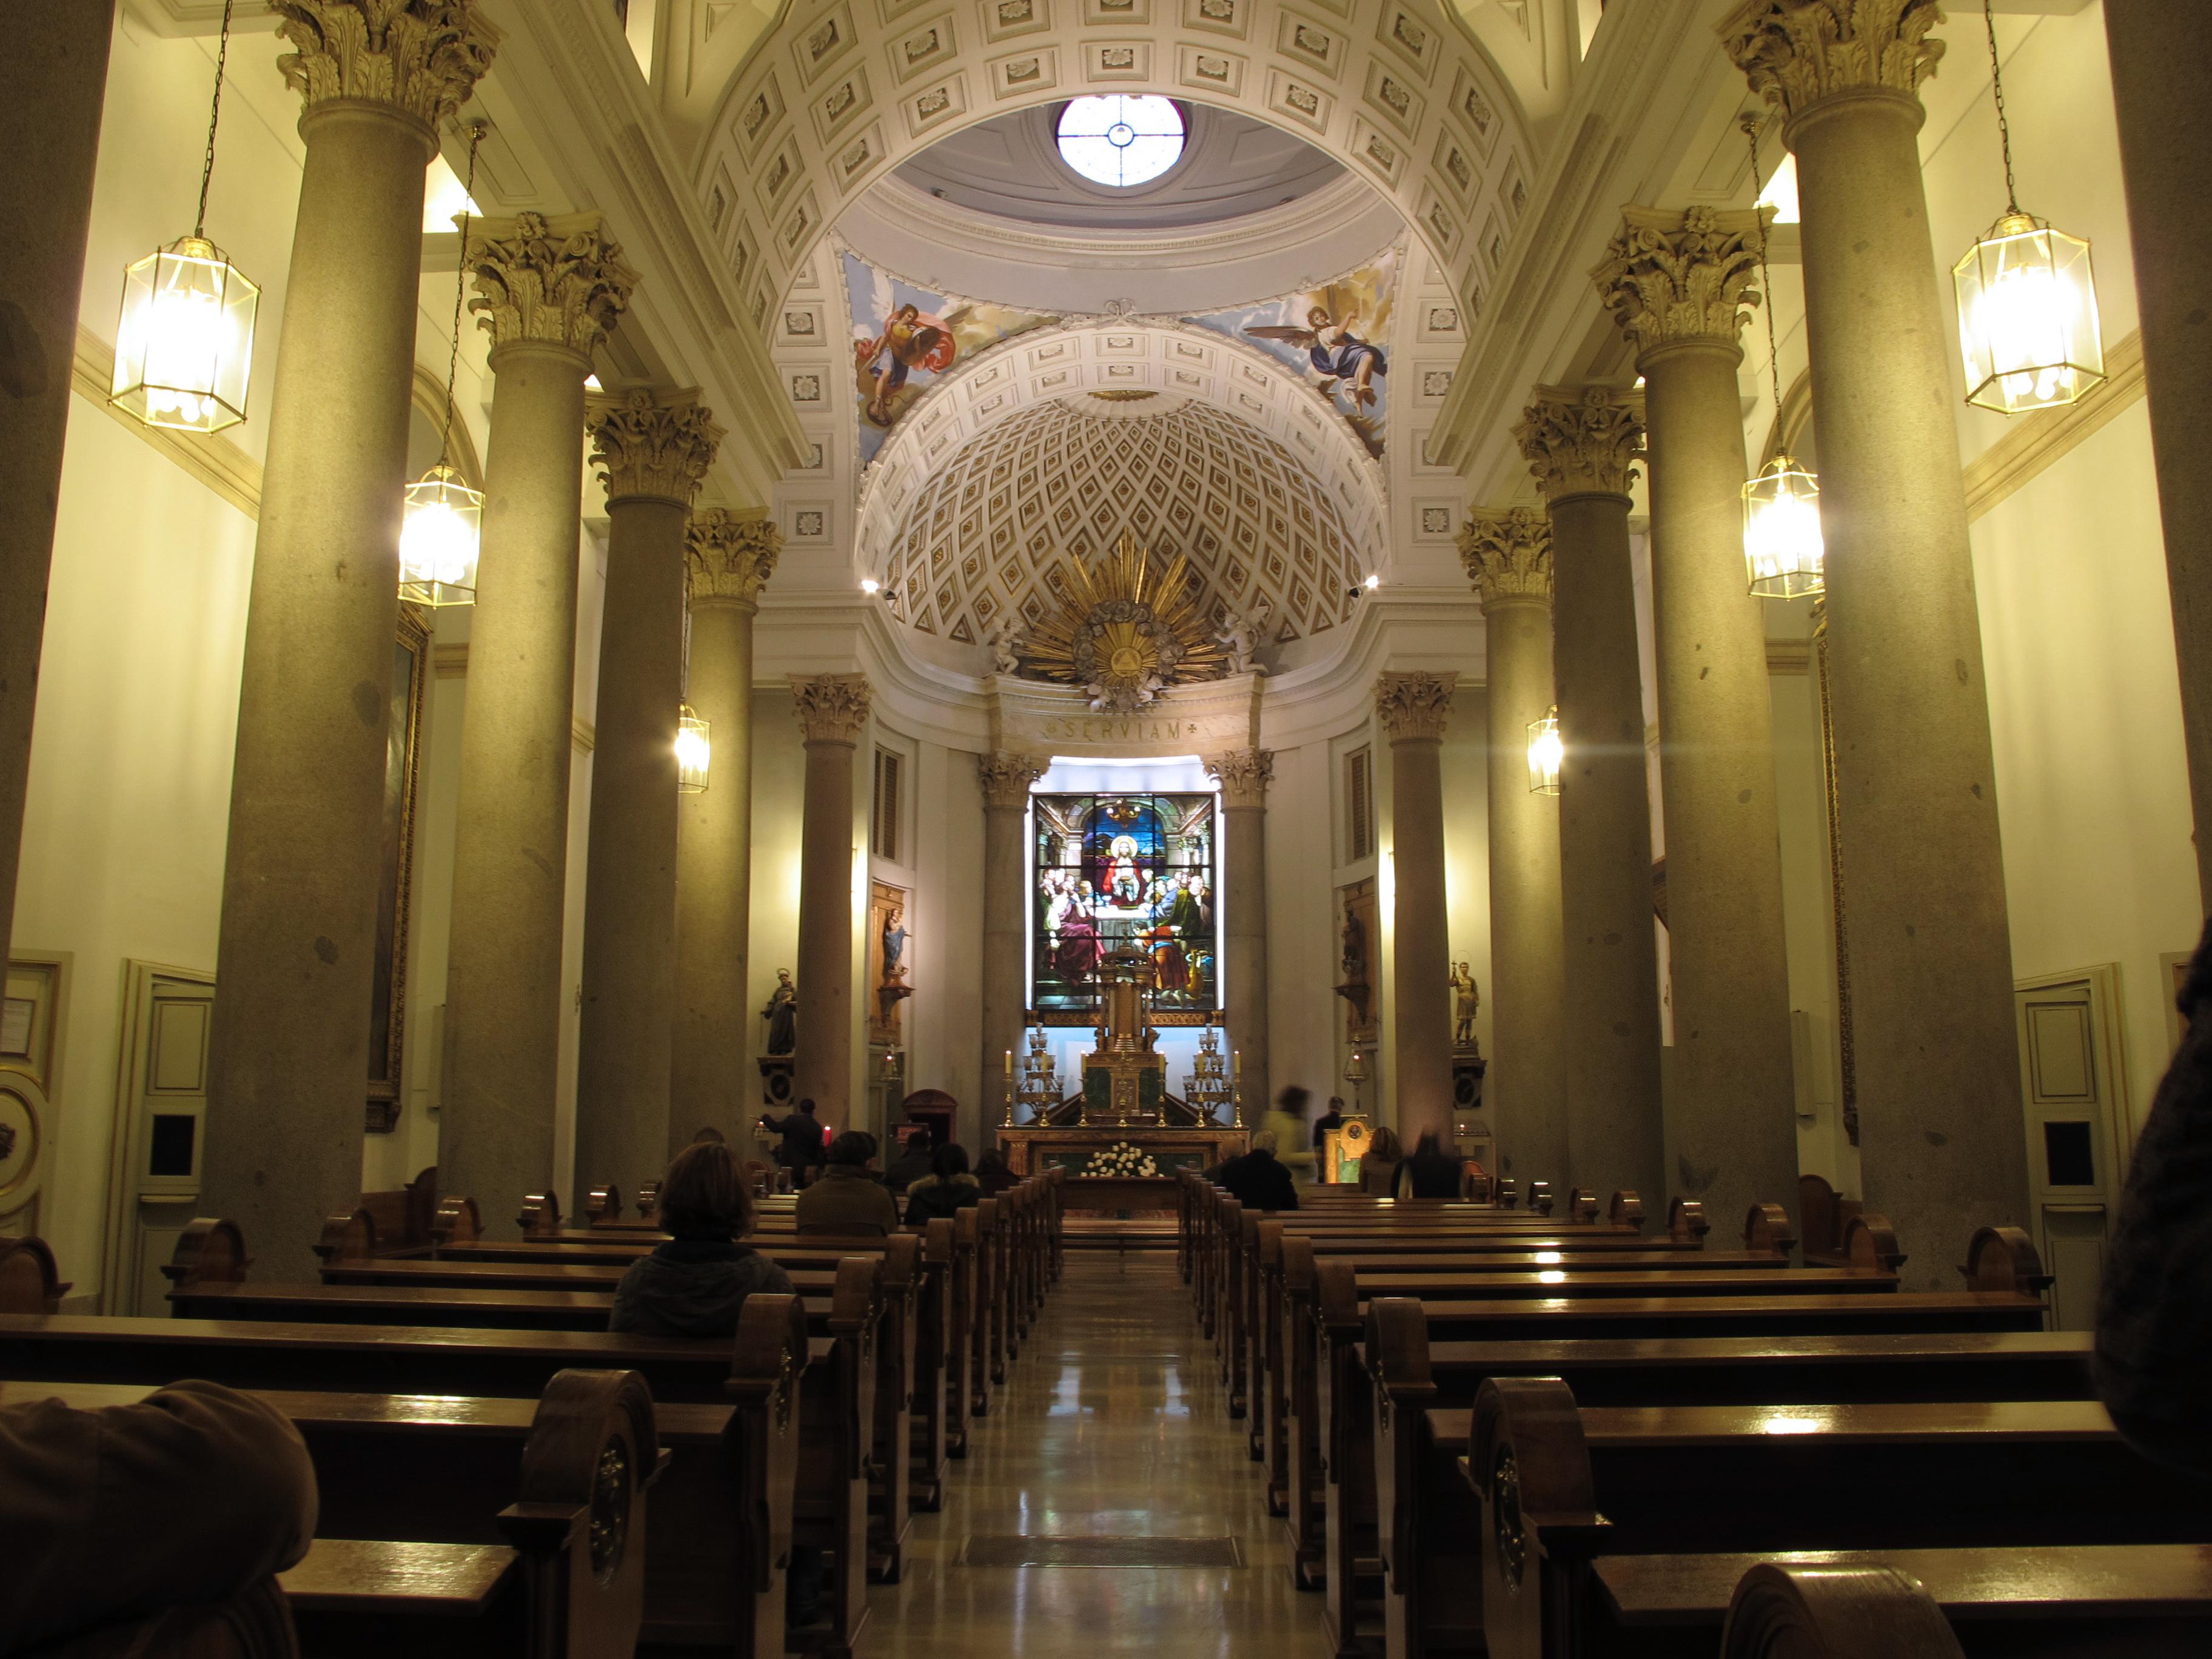 File:Real Oratorio Caballero de Gracia, Madrid.jpg